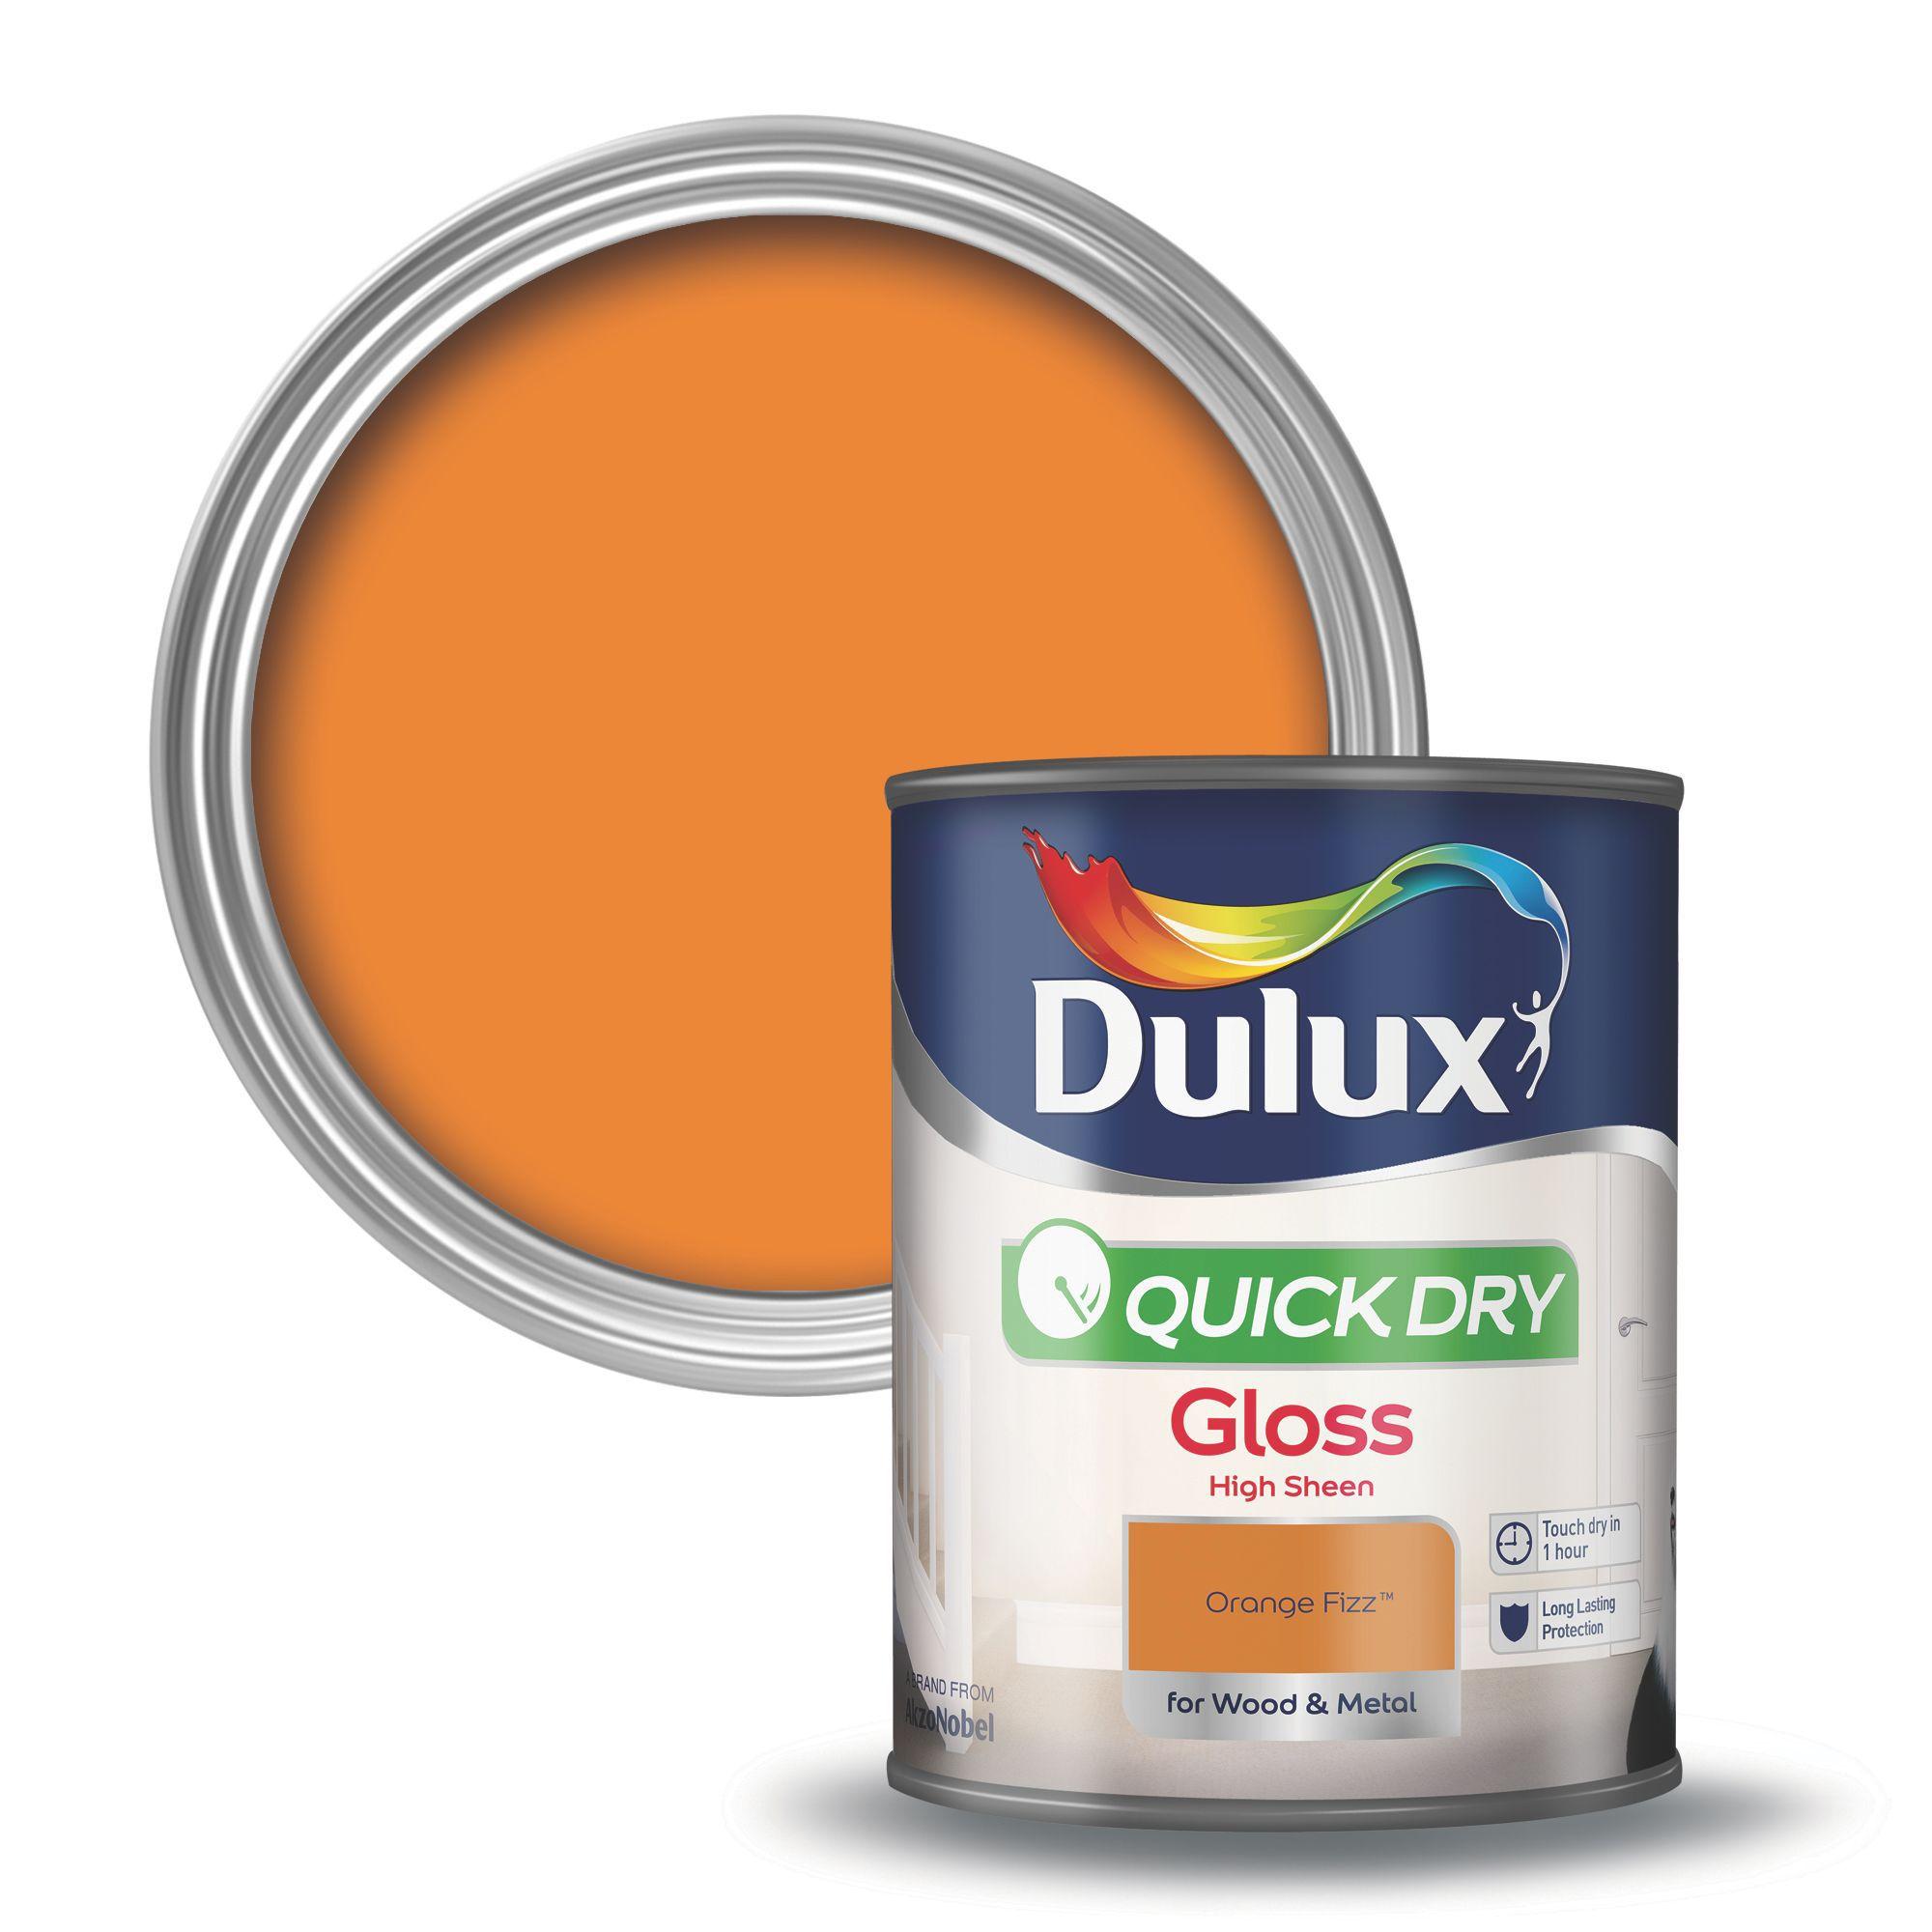 Dulux Interior Orange Fizz Gloss Wood & Metal Paint 750ml